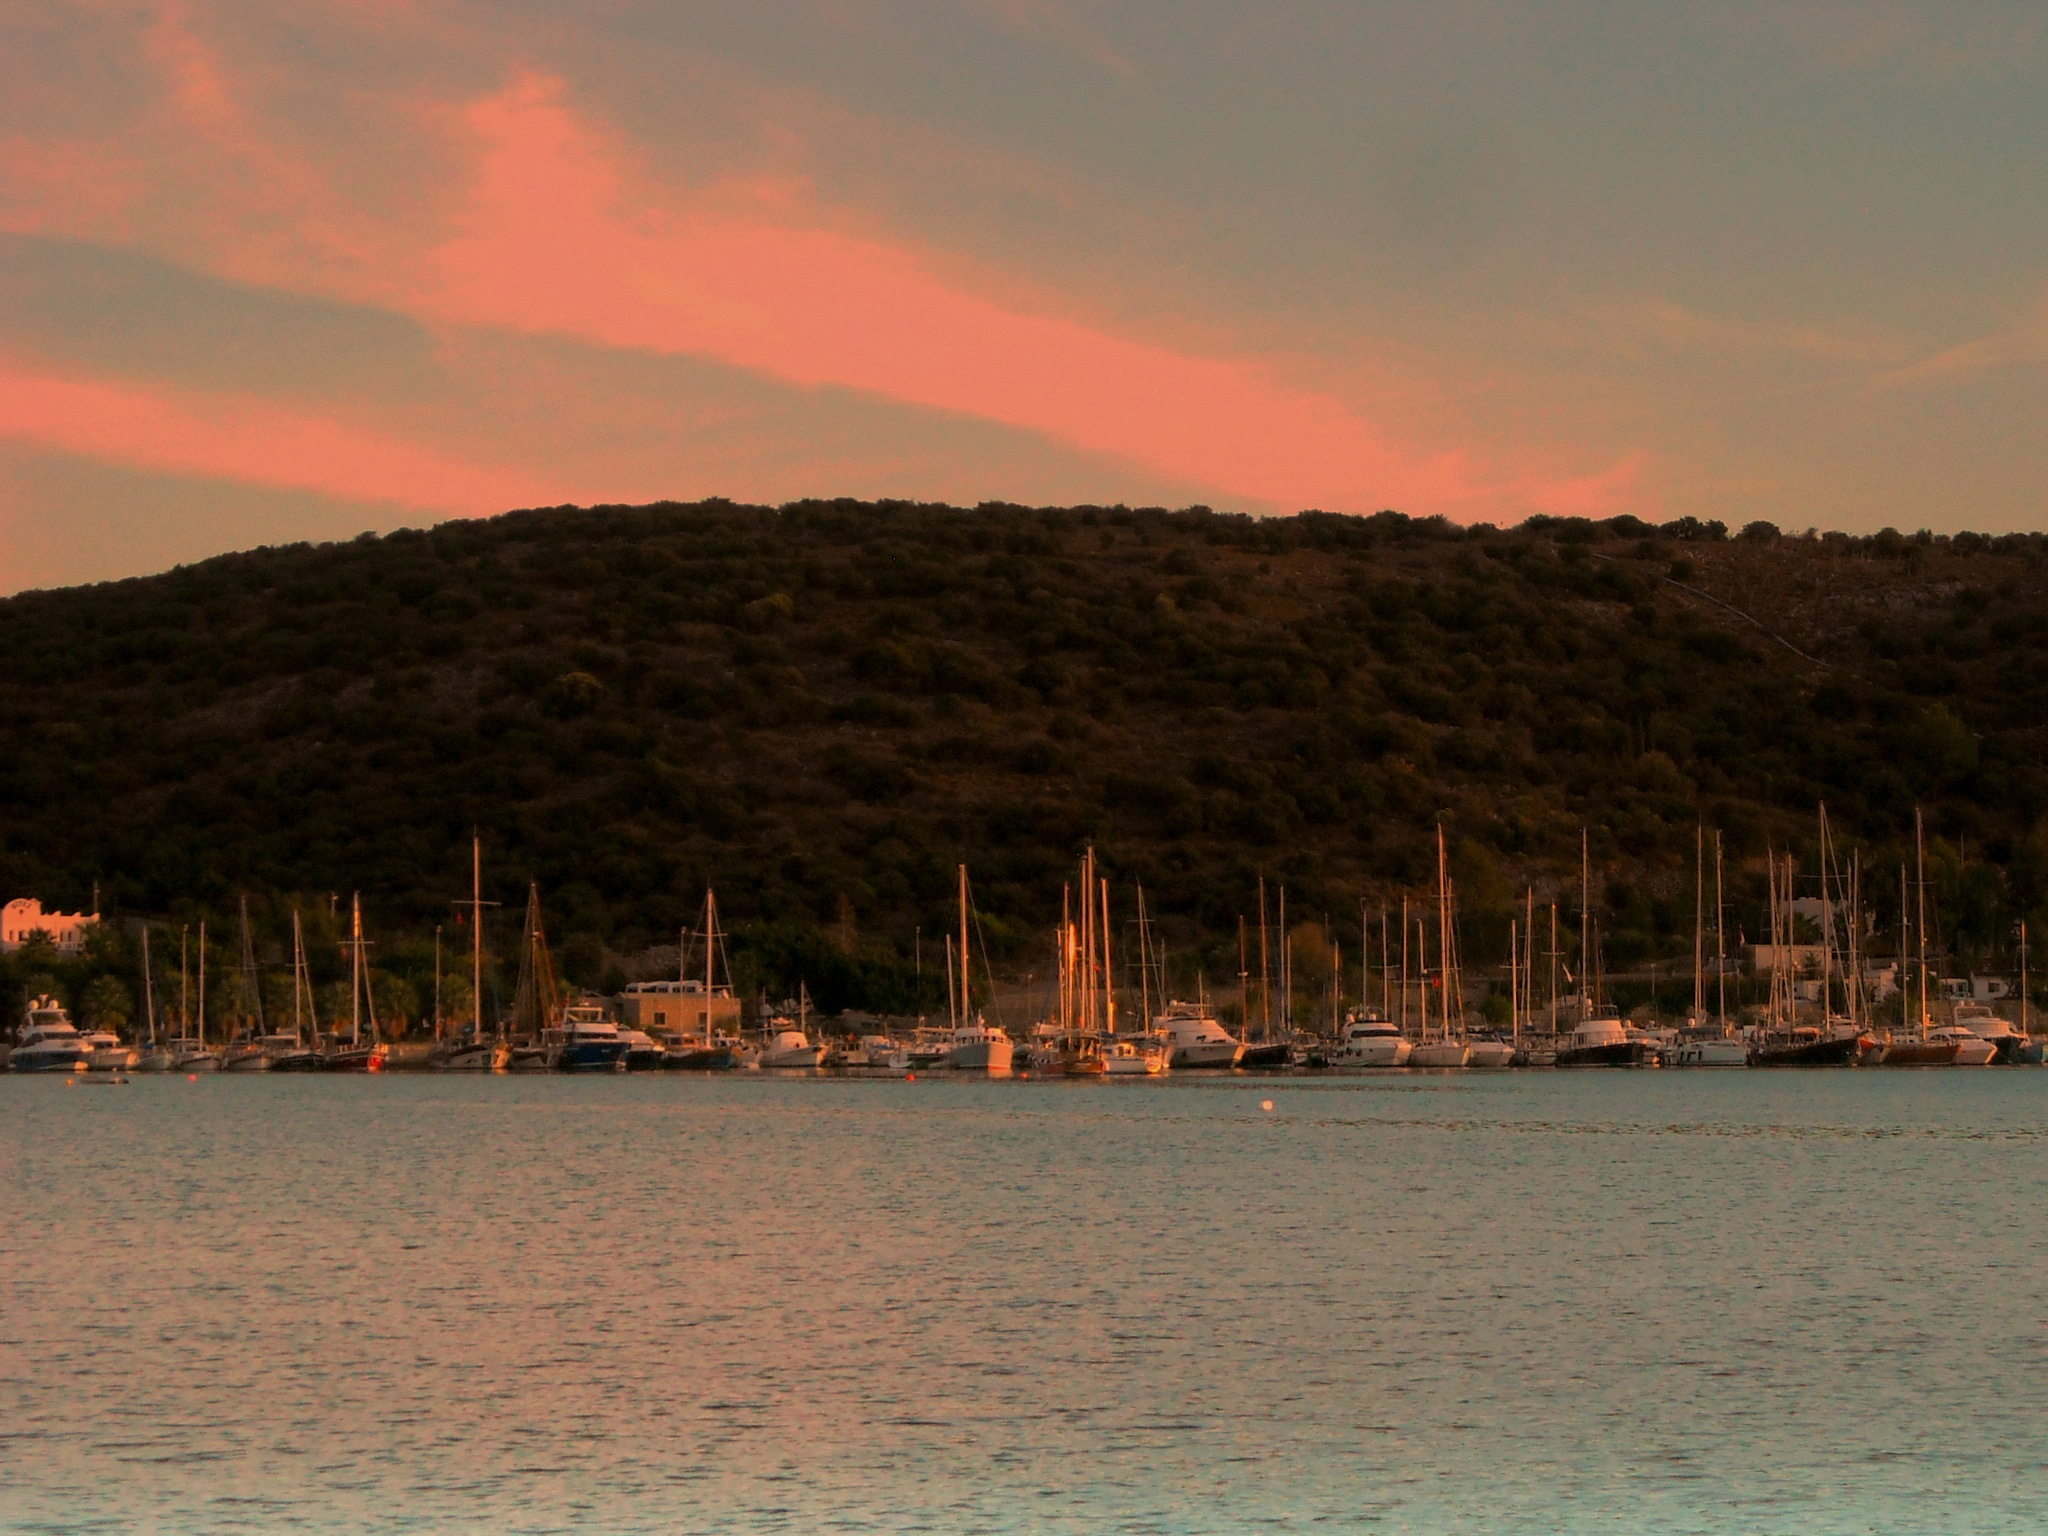 BITEZ PIER AT SUNSET, FULL SCREEN by Akin Saner